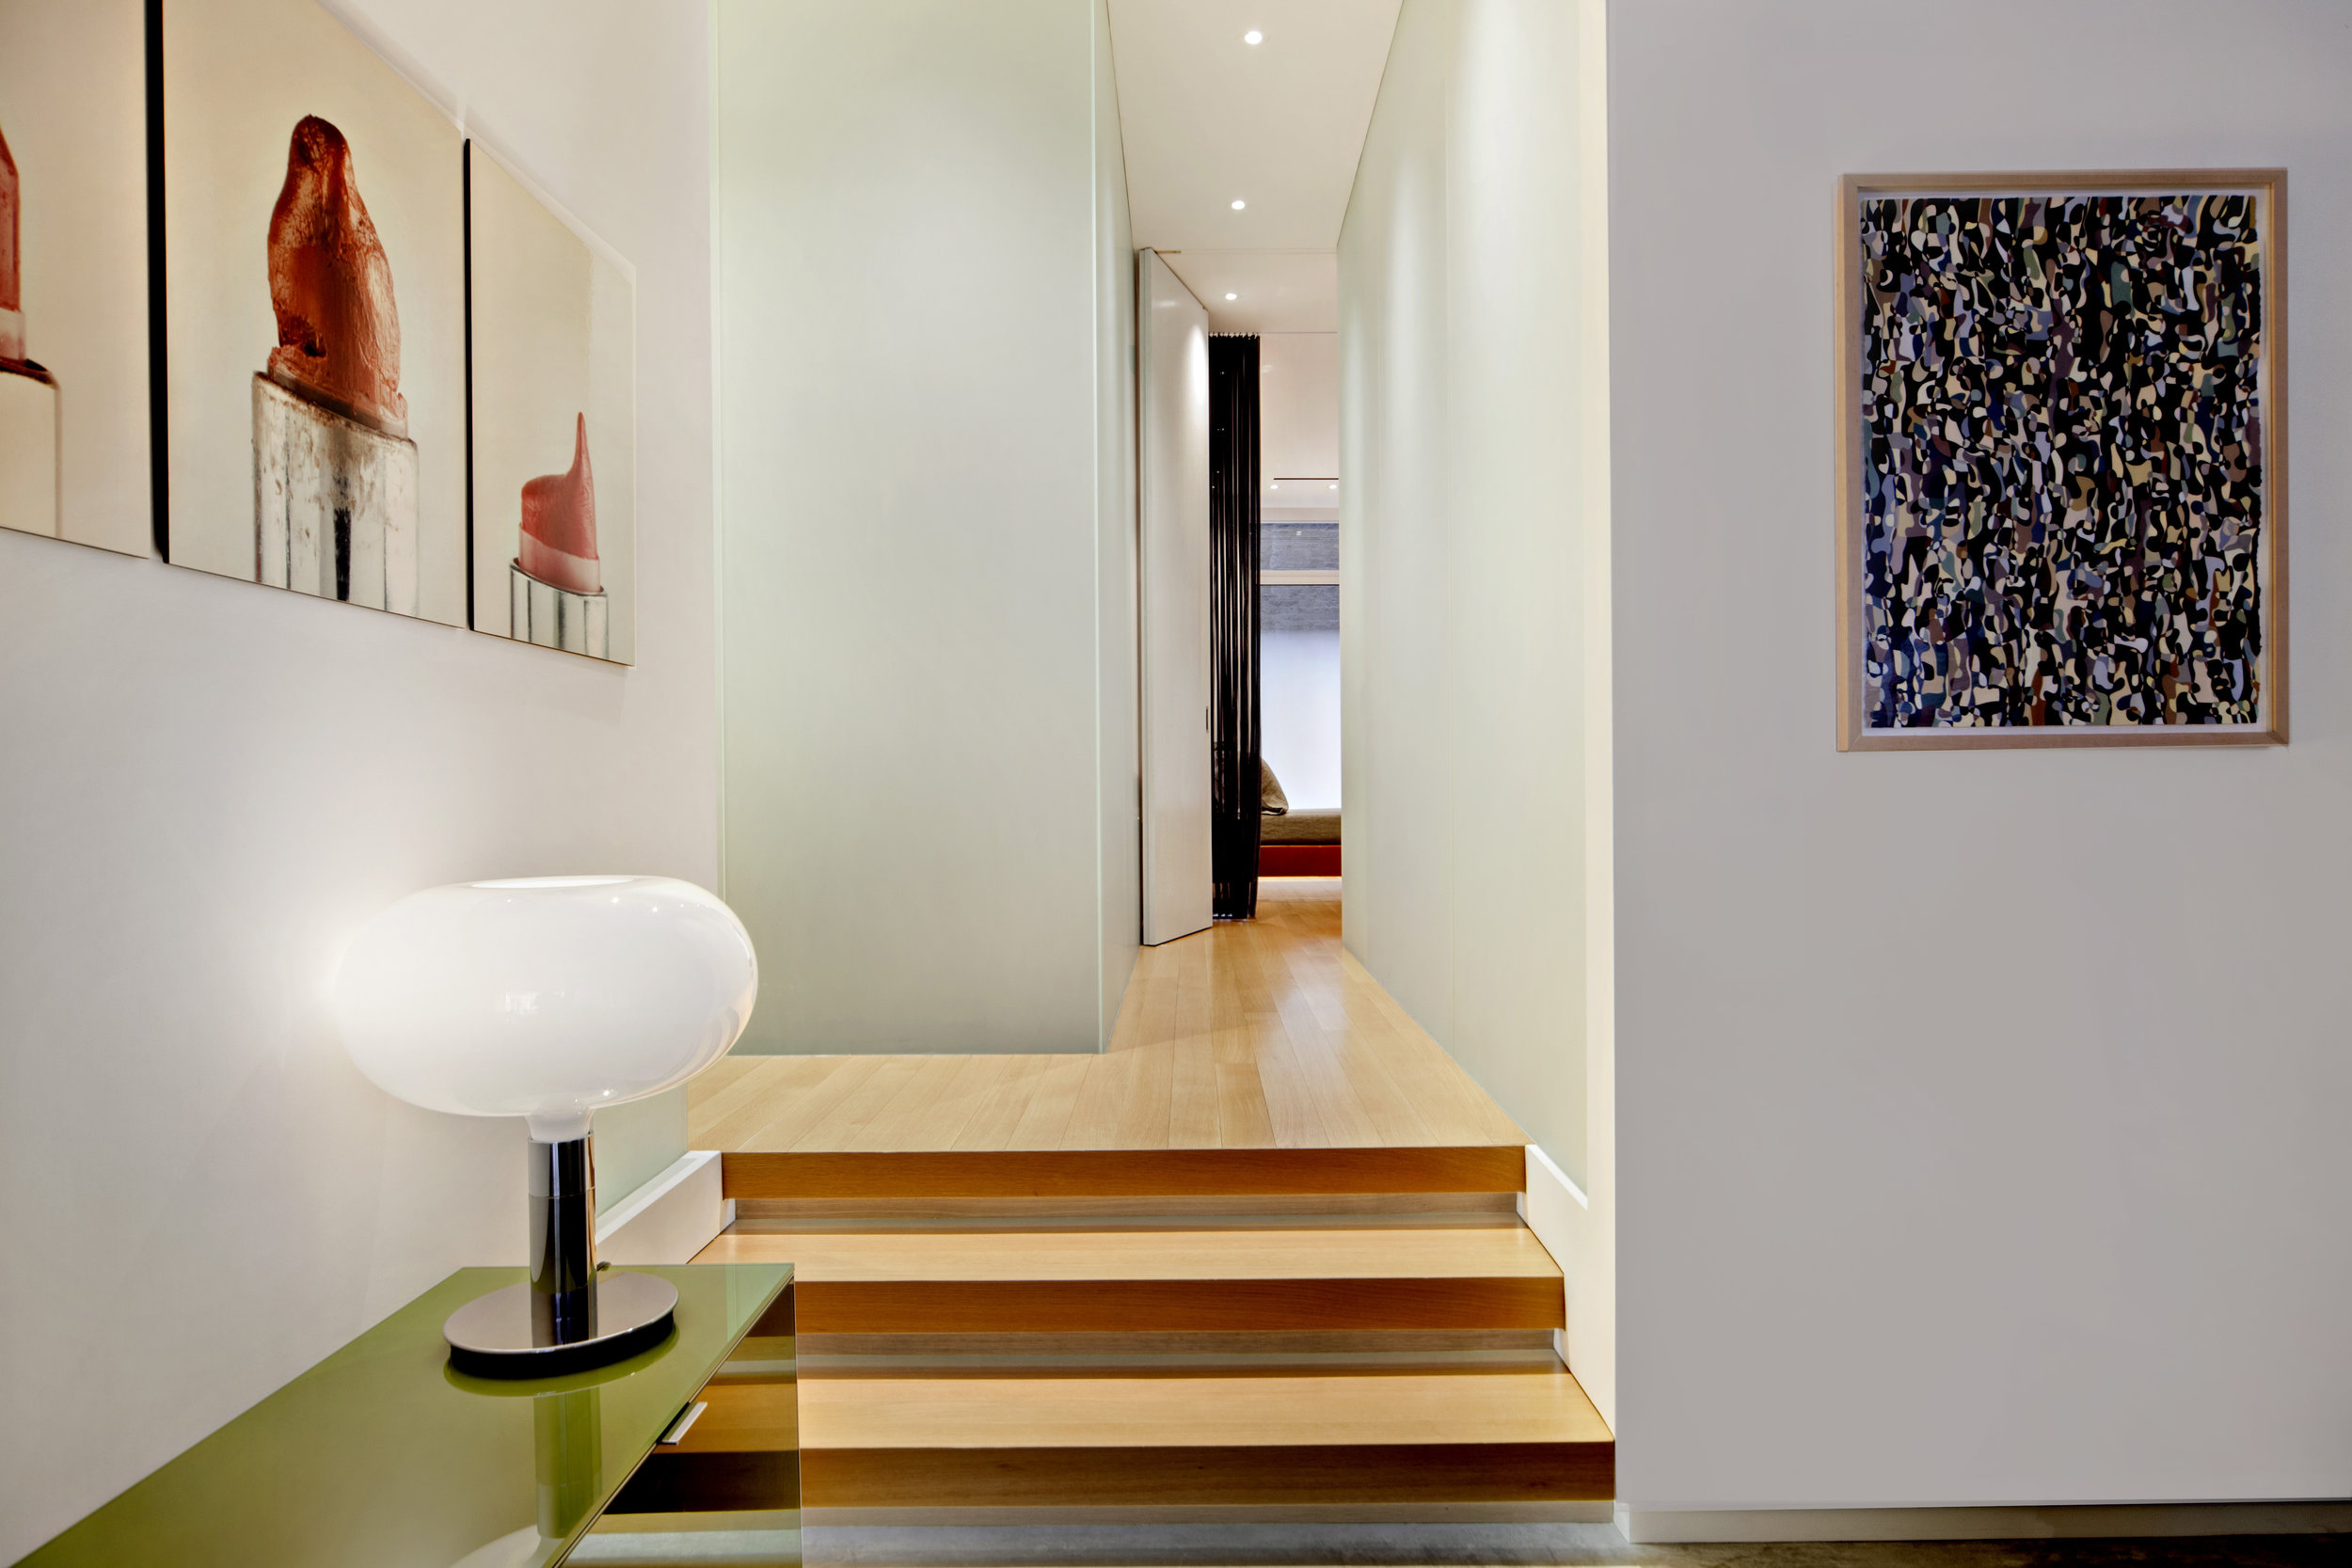 832Broadway_stairs.jpg